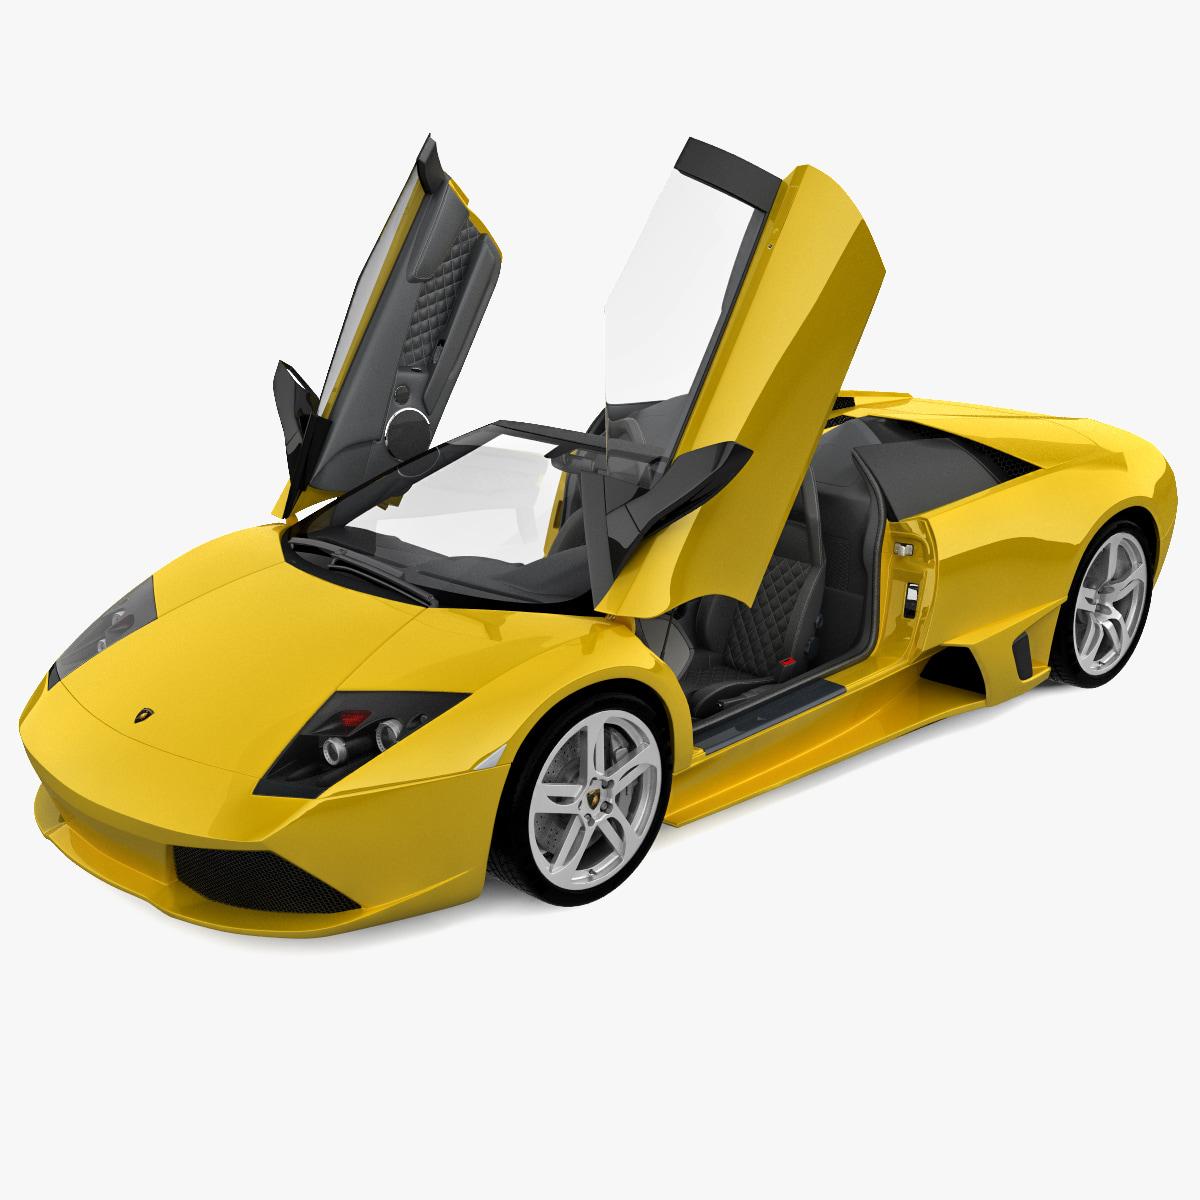 Lamborghini_Murcielago_Roadster_00.jpg